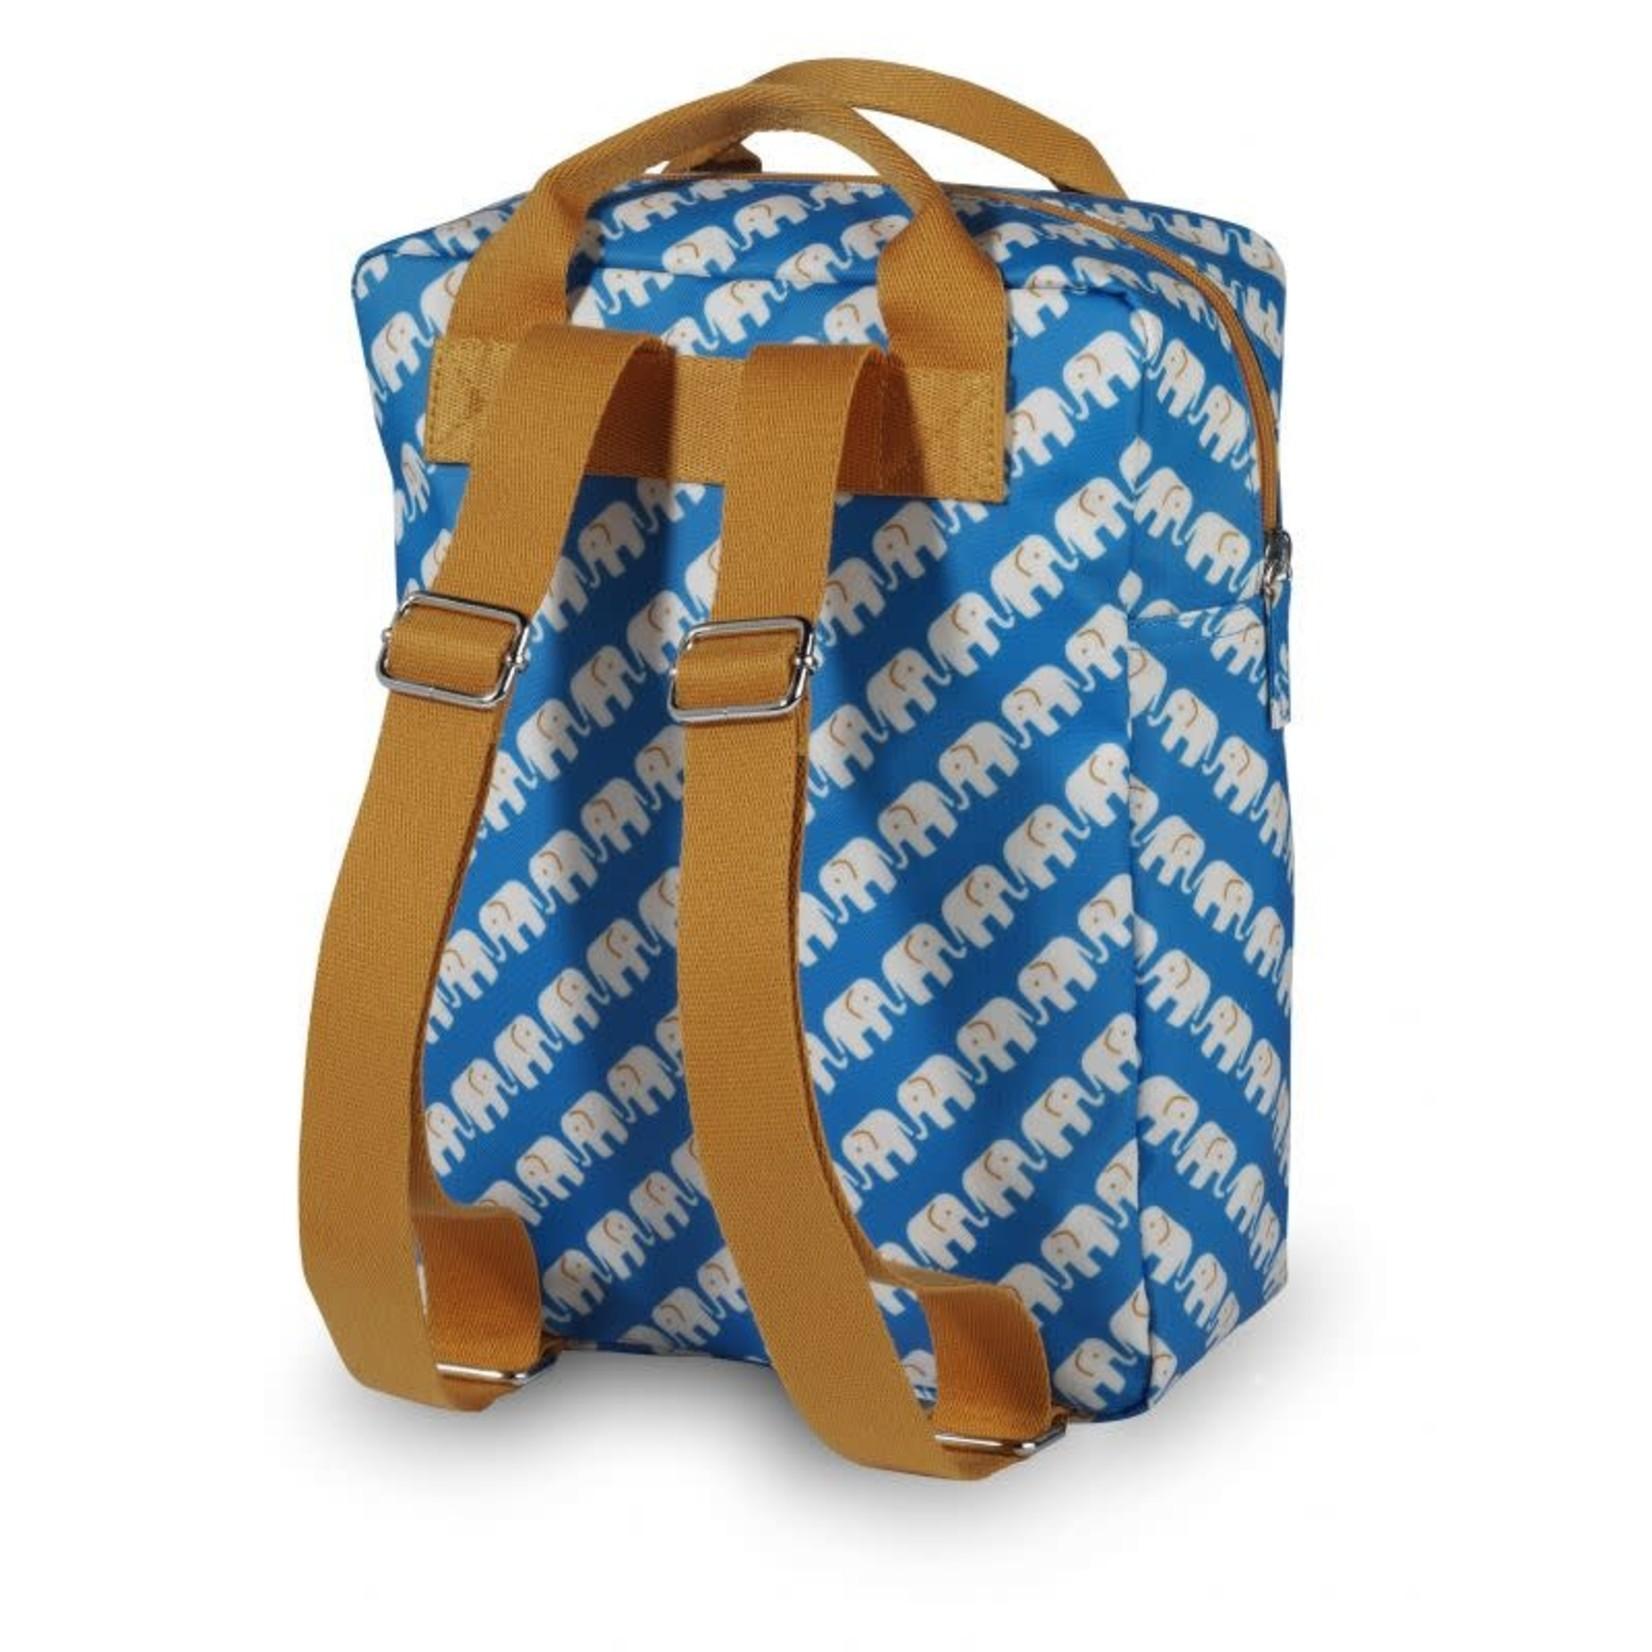 ENGEL ENGEL backpack  Elepant blue